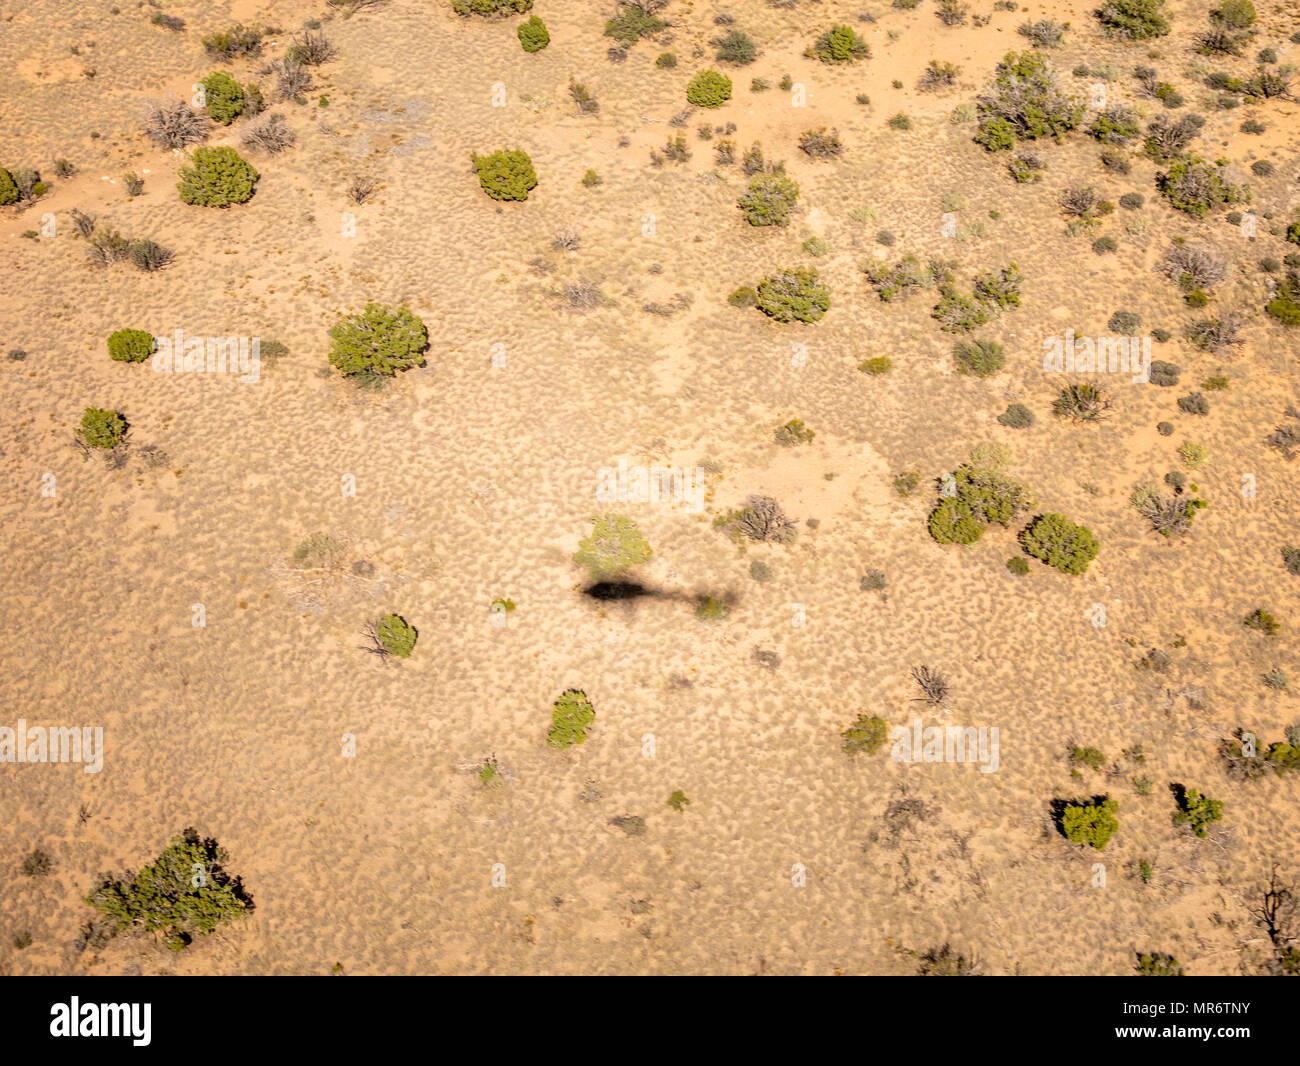 Helicoper shadow on the Nevada Desert - Stock Image